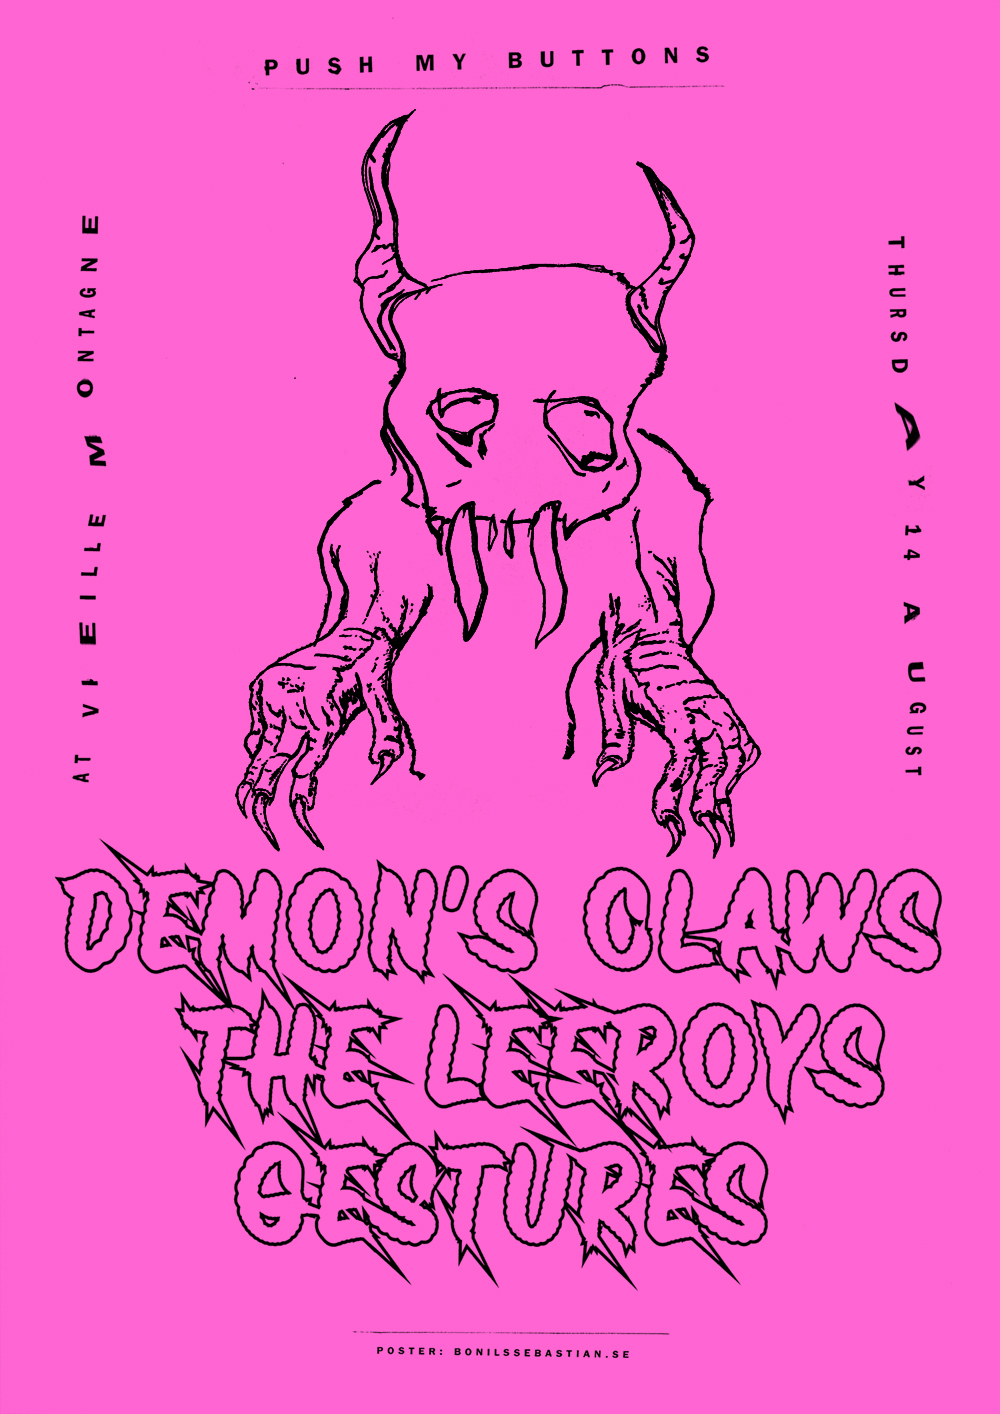 DemonsClaws_Web